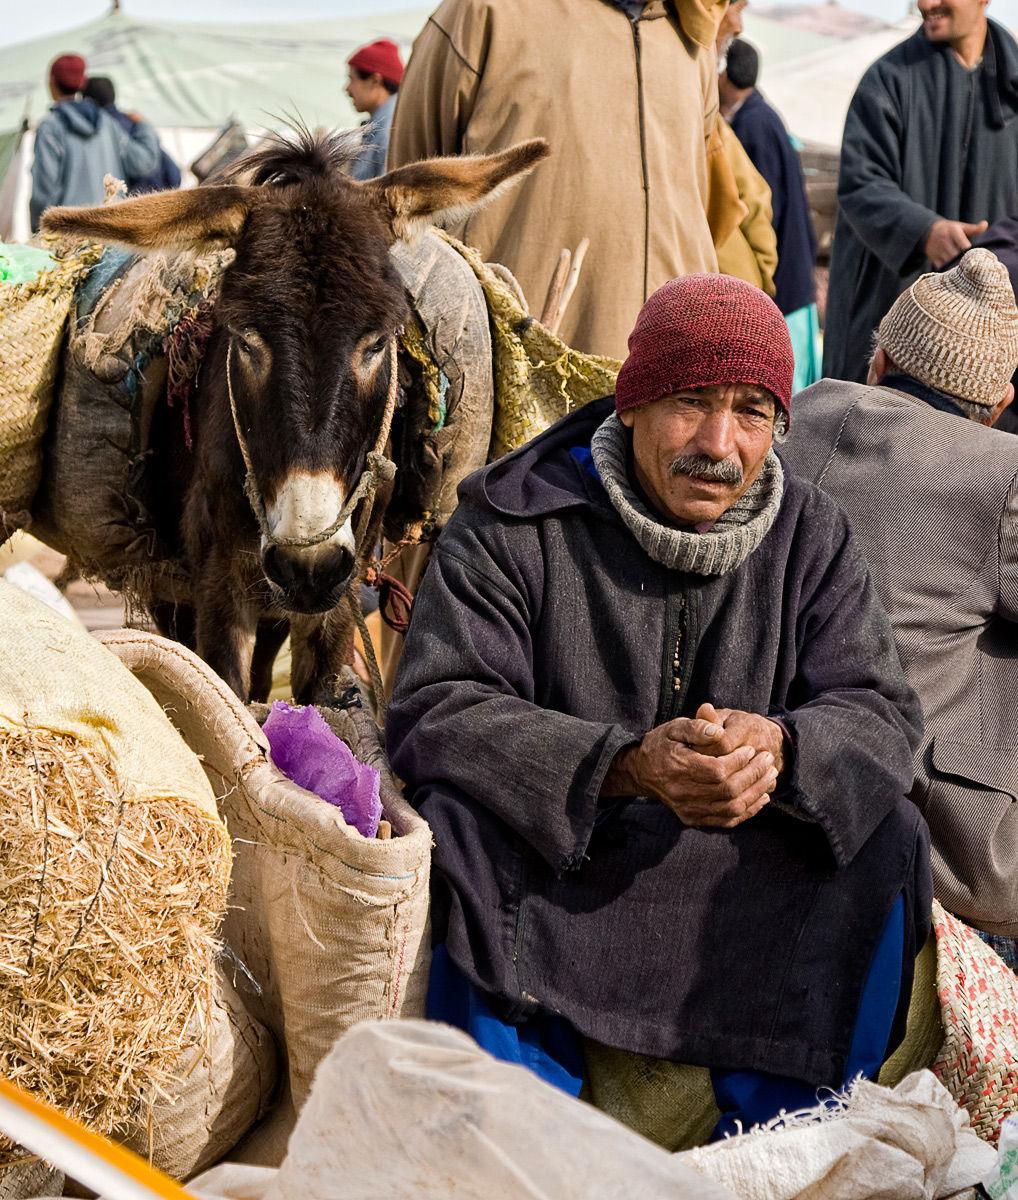 Moroccan Street Merchant and Donkey